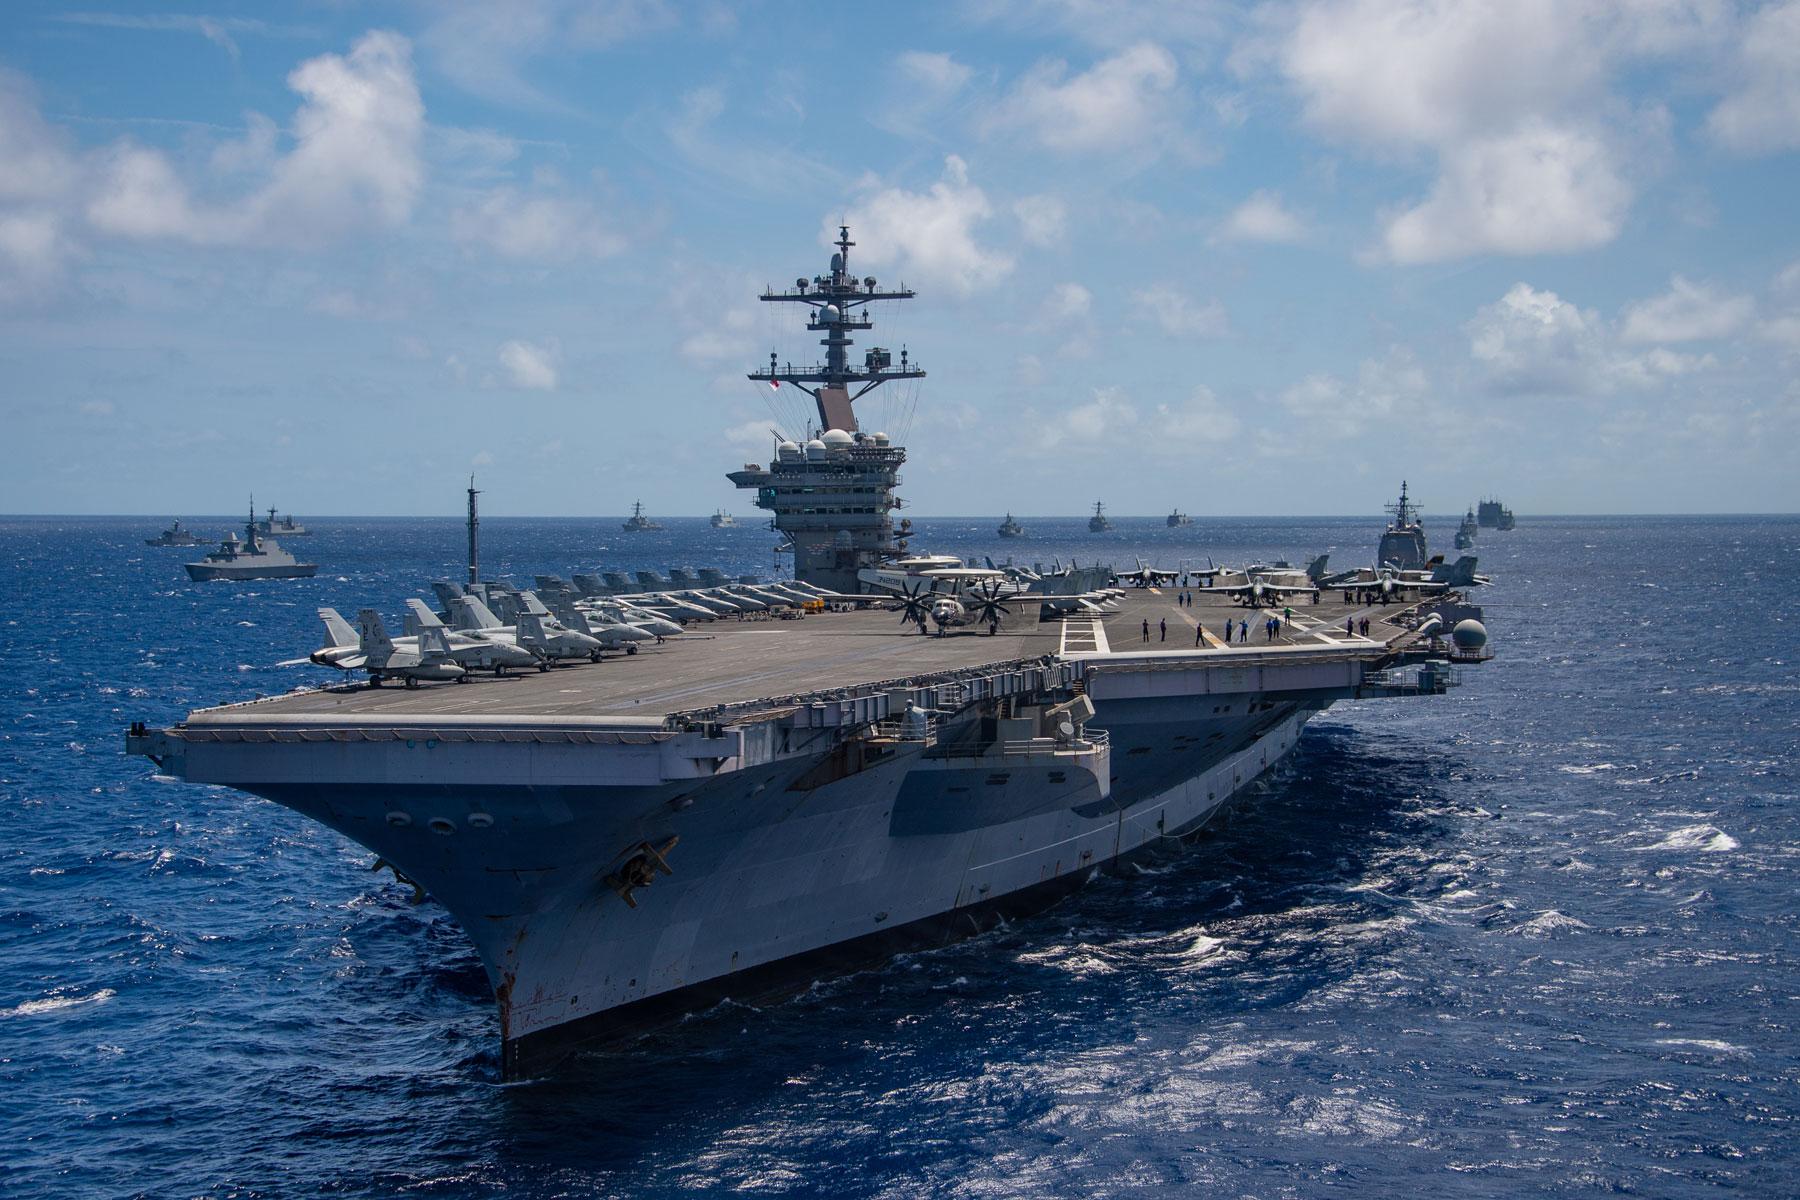 USS Carl Vinson 1800